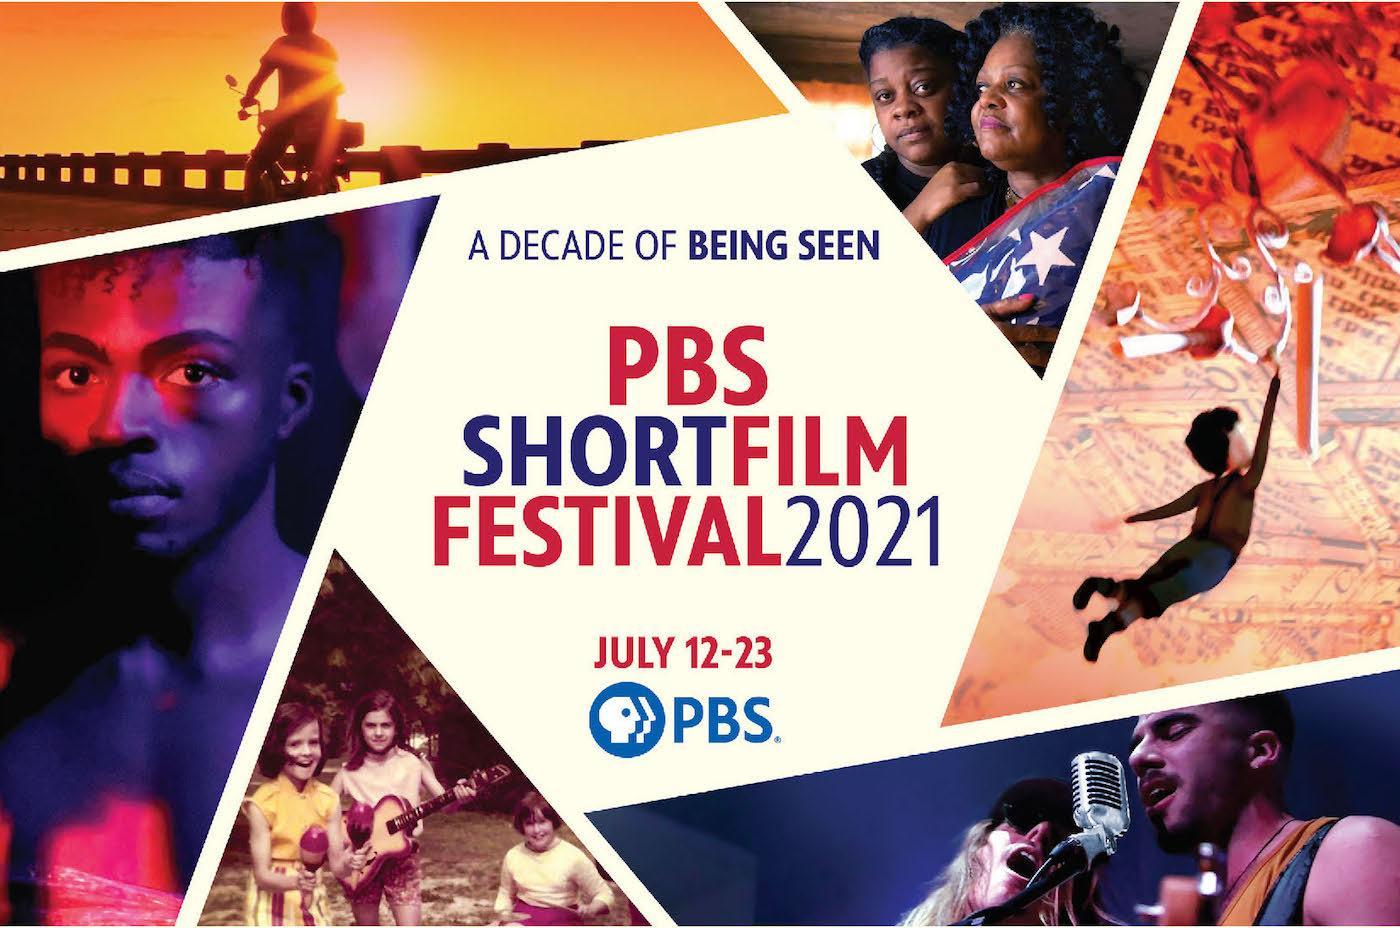 PBS Short Film Festival 2021